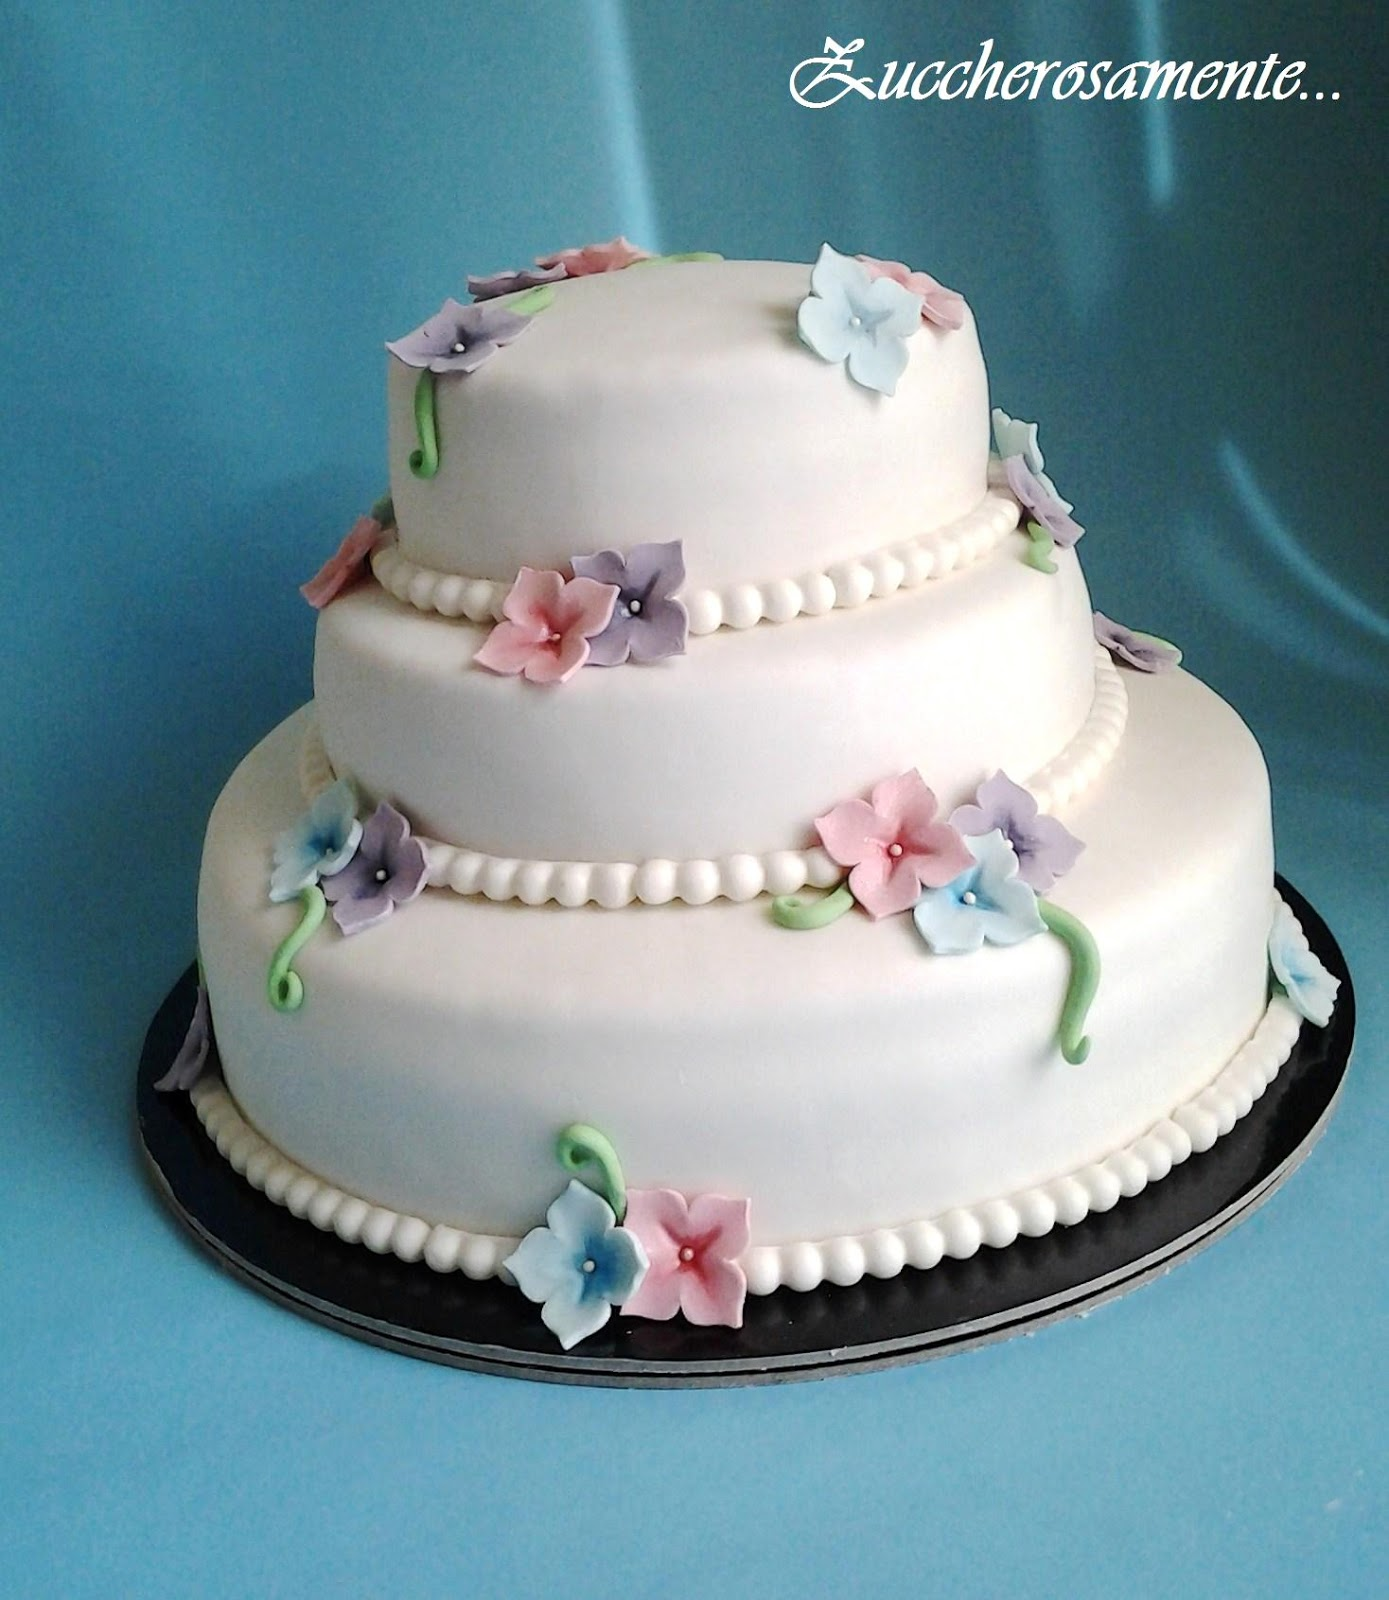 Estremamente Zuccherosamente: Torta cresima romantica per Beatrice UB52